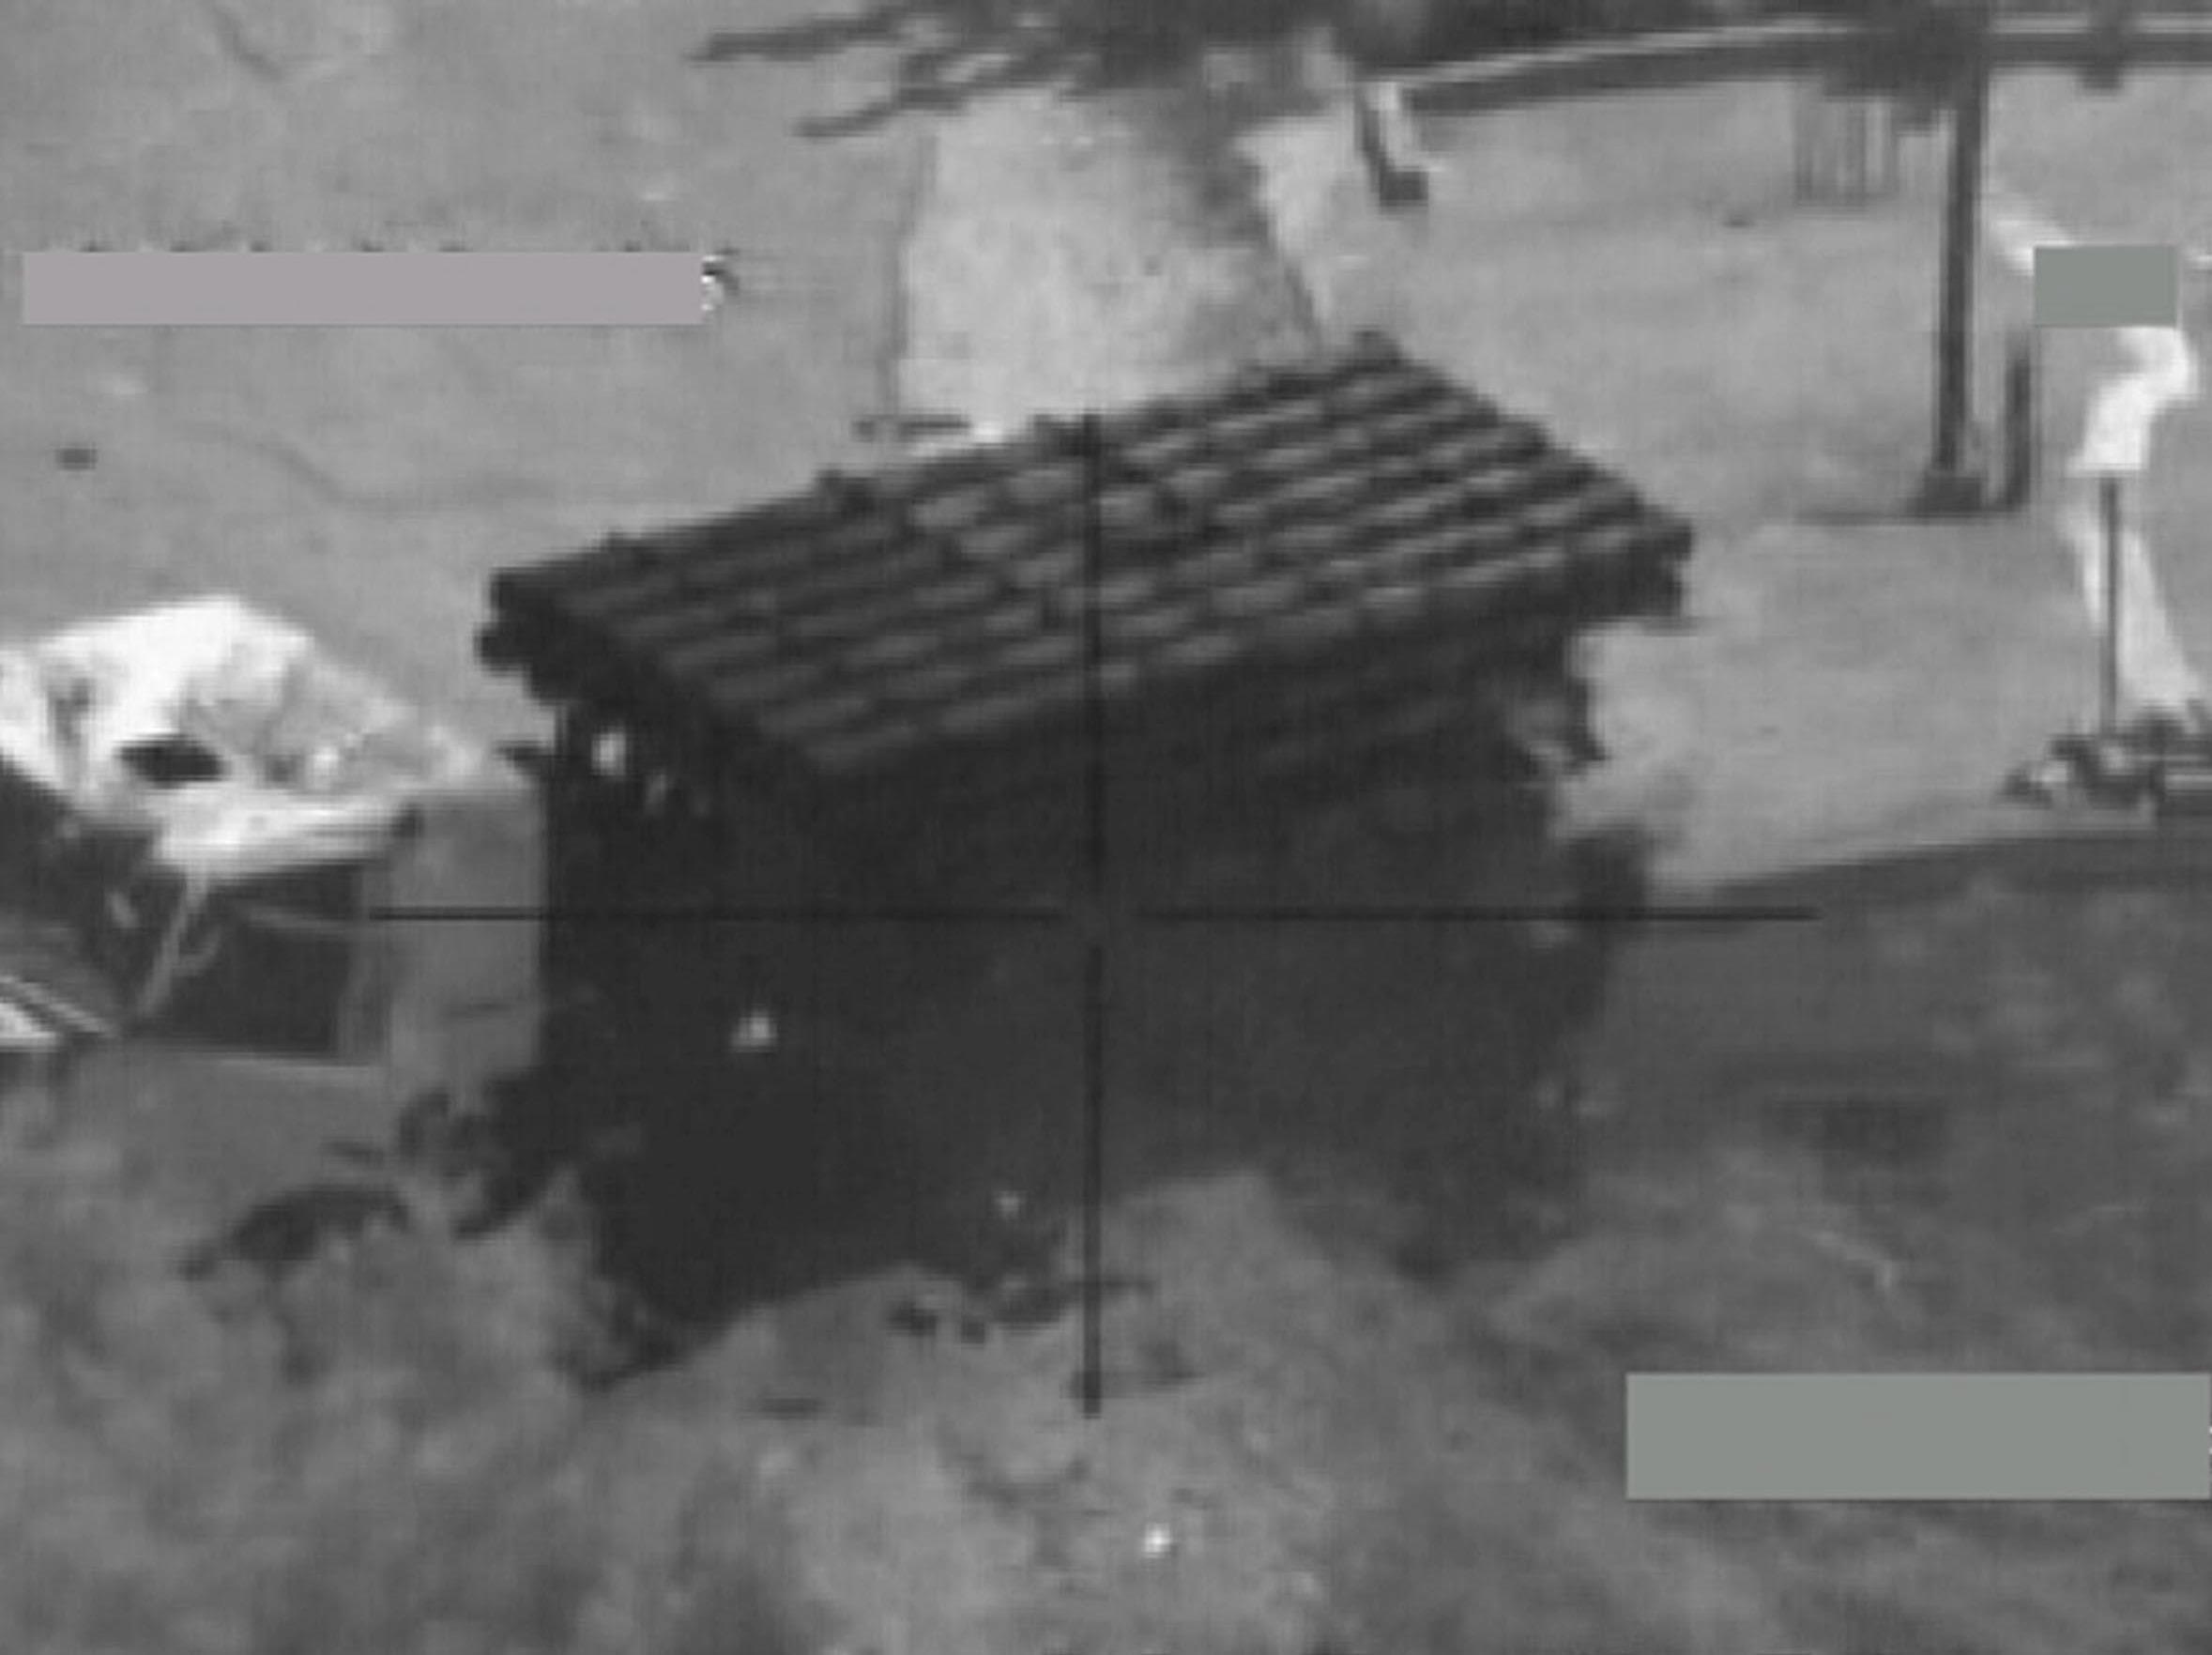 File:Flickr - Israel Defense Forces - IAF Bombs Katyusha